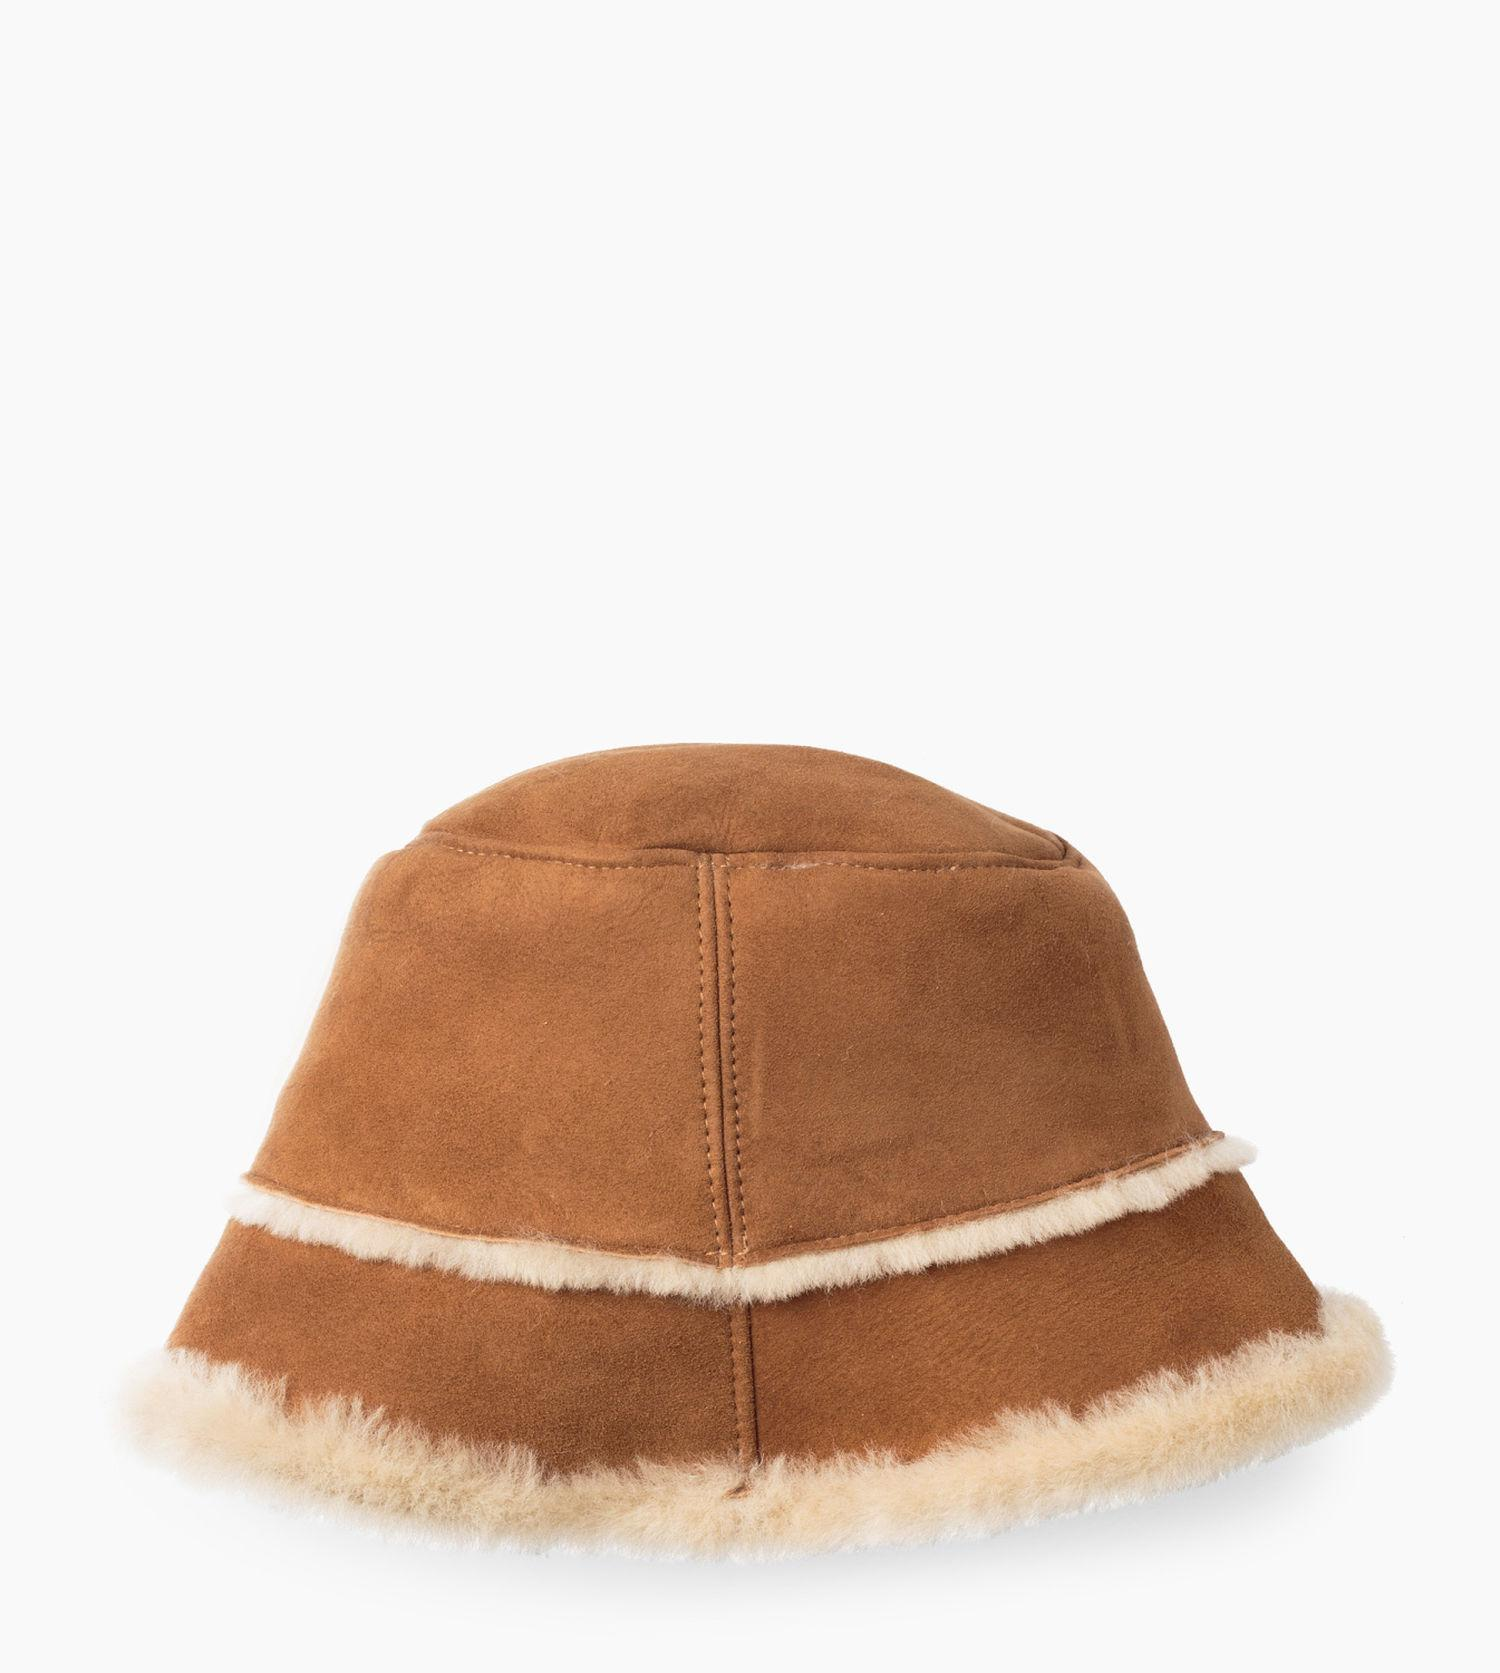 b1778ab9 UGG Women's Sheepskin Bucket Hat in Brown - Lyst